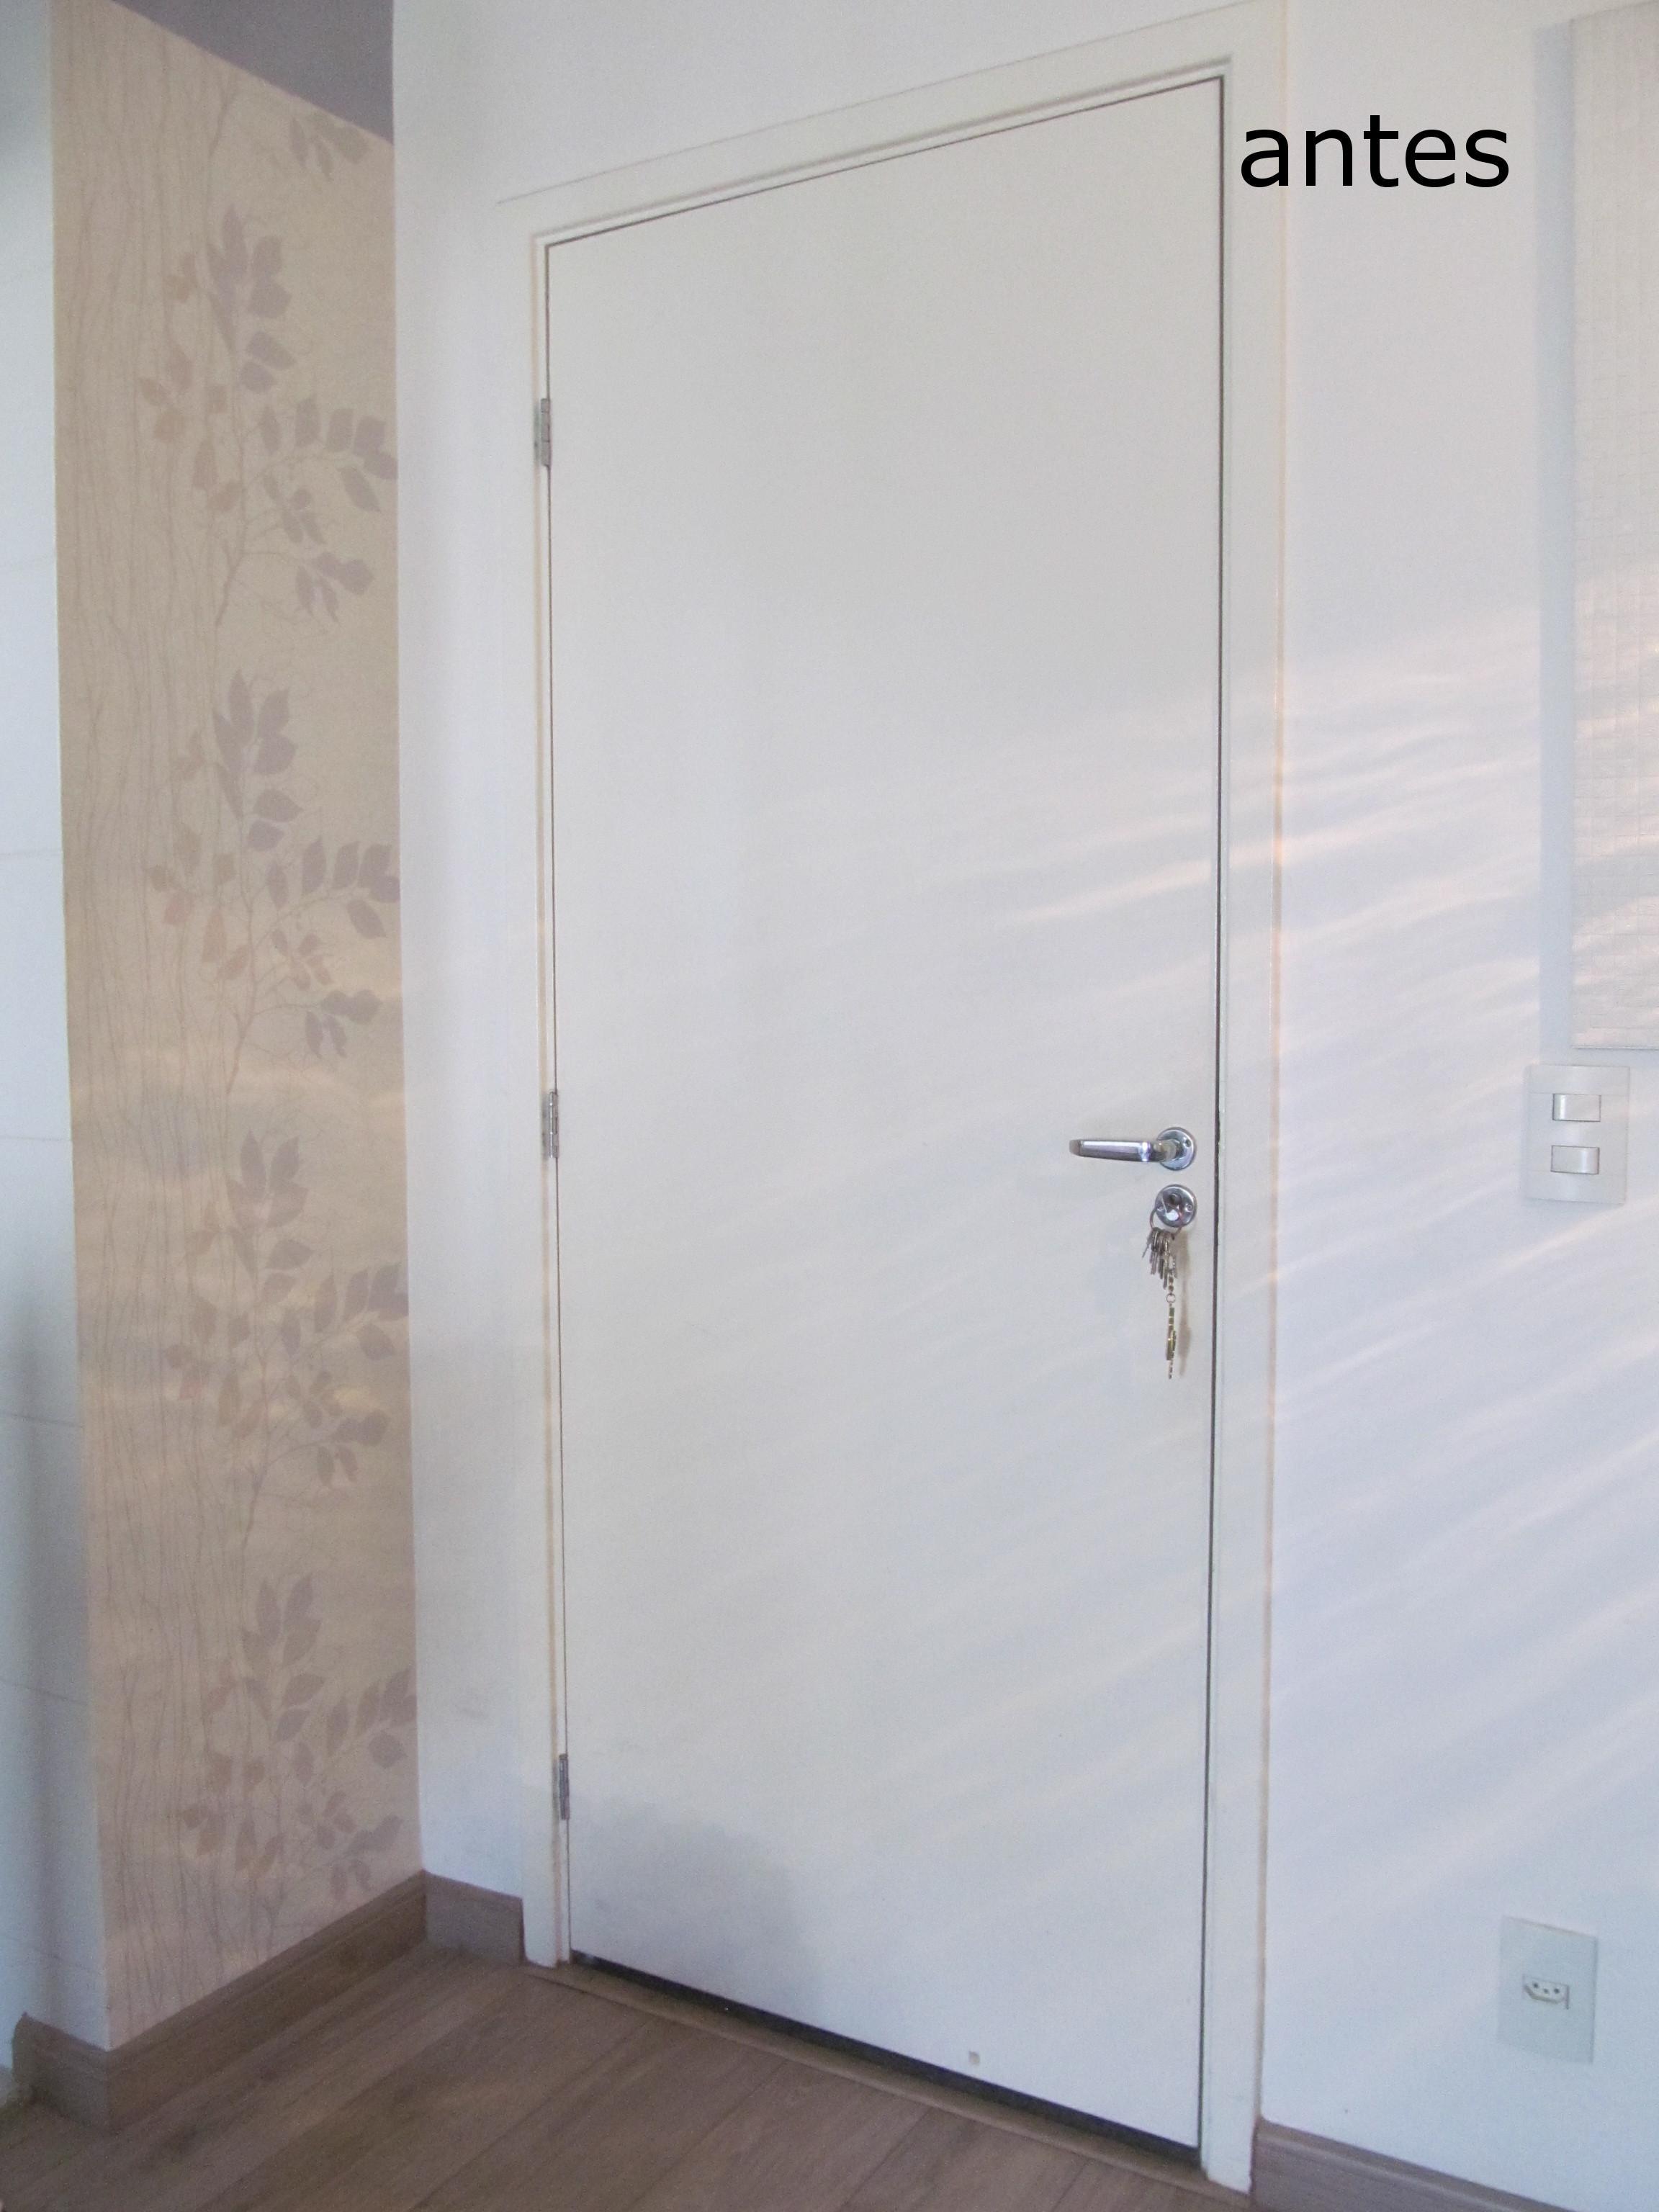 nova porta de entrada: madeira sólida laqueada a saga do  #546377 2304x3072 Banheiro Com 2 Portas De Entrada